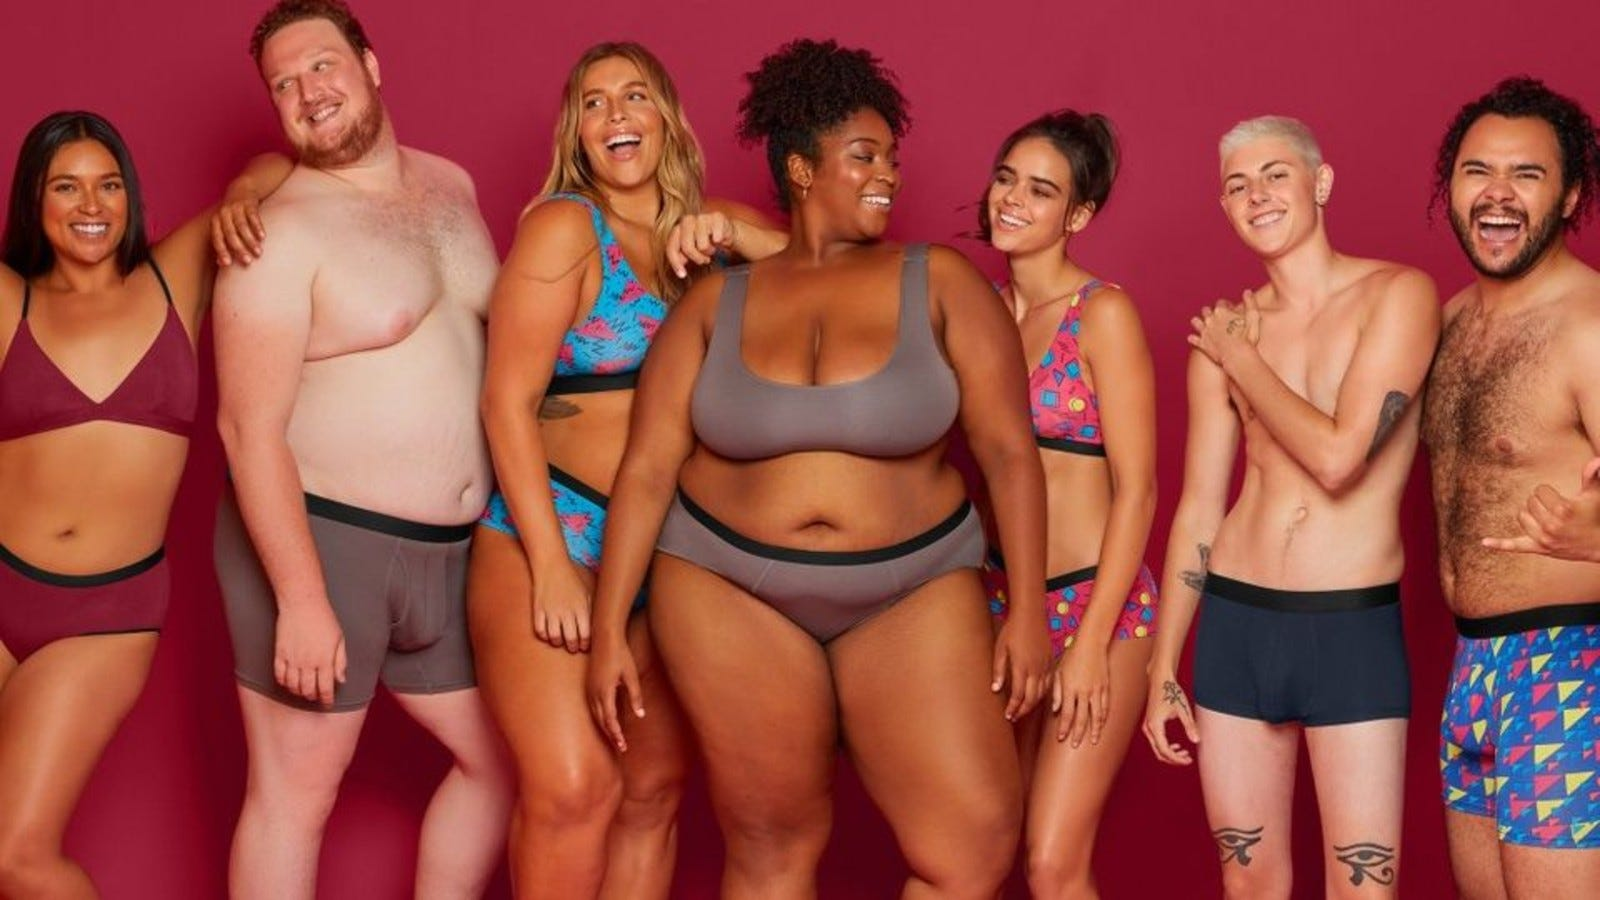 Seven men and women all wearing MeUndies underwear.